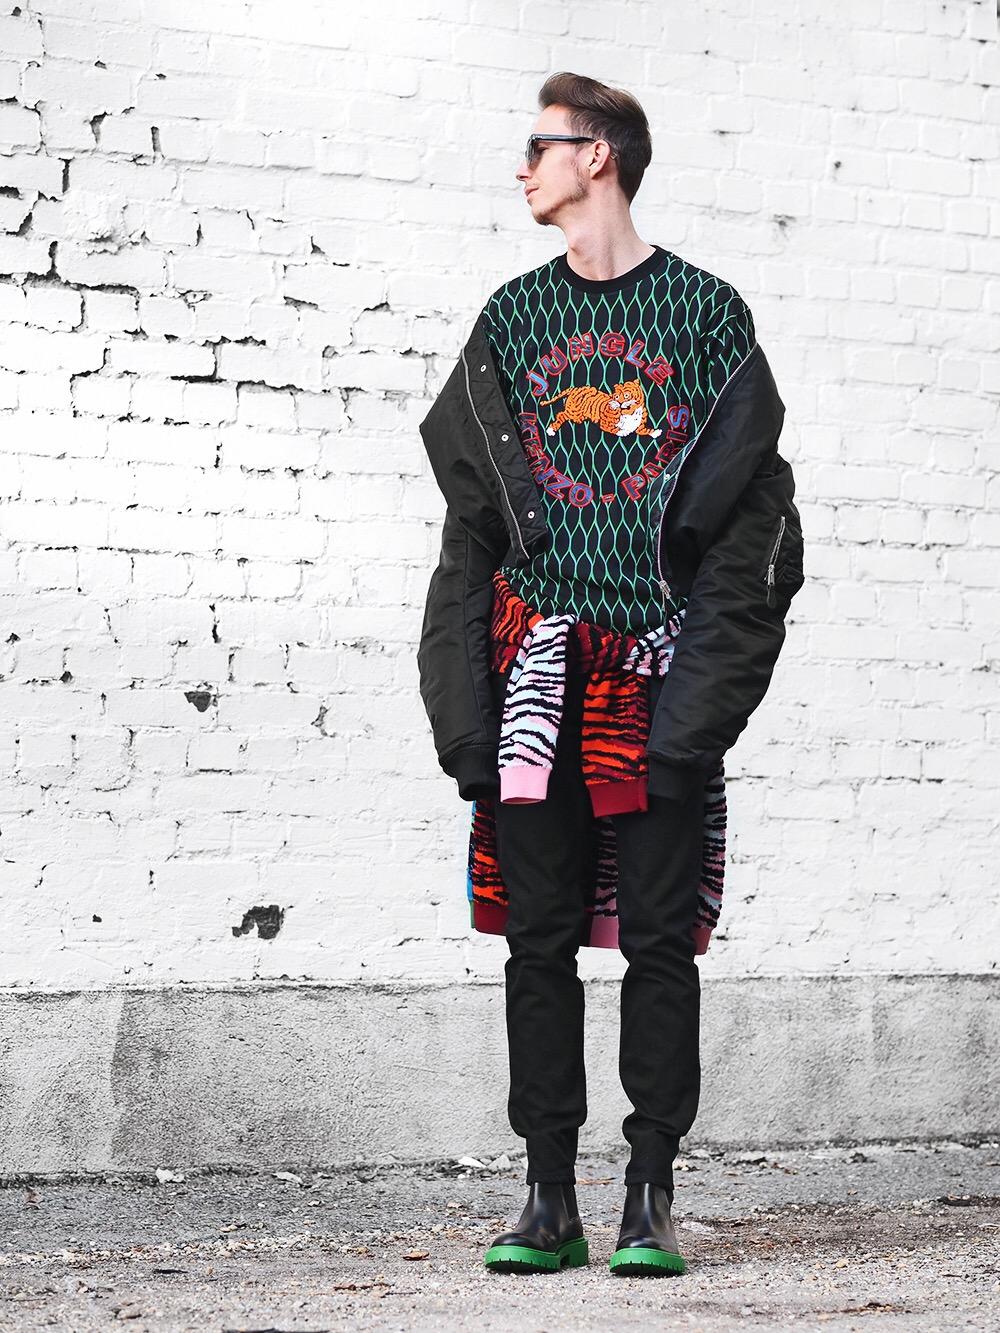 kenzoxhm-outfit-vibrant-playful-pattern-kenzo-hm-outfit-smizedivat-fashionblogger-streetstyle-menswear-collection-_2.JPG